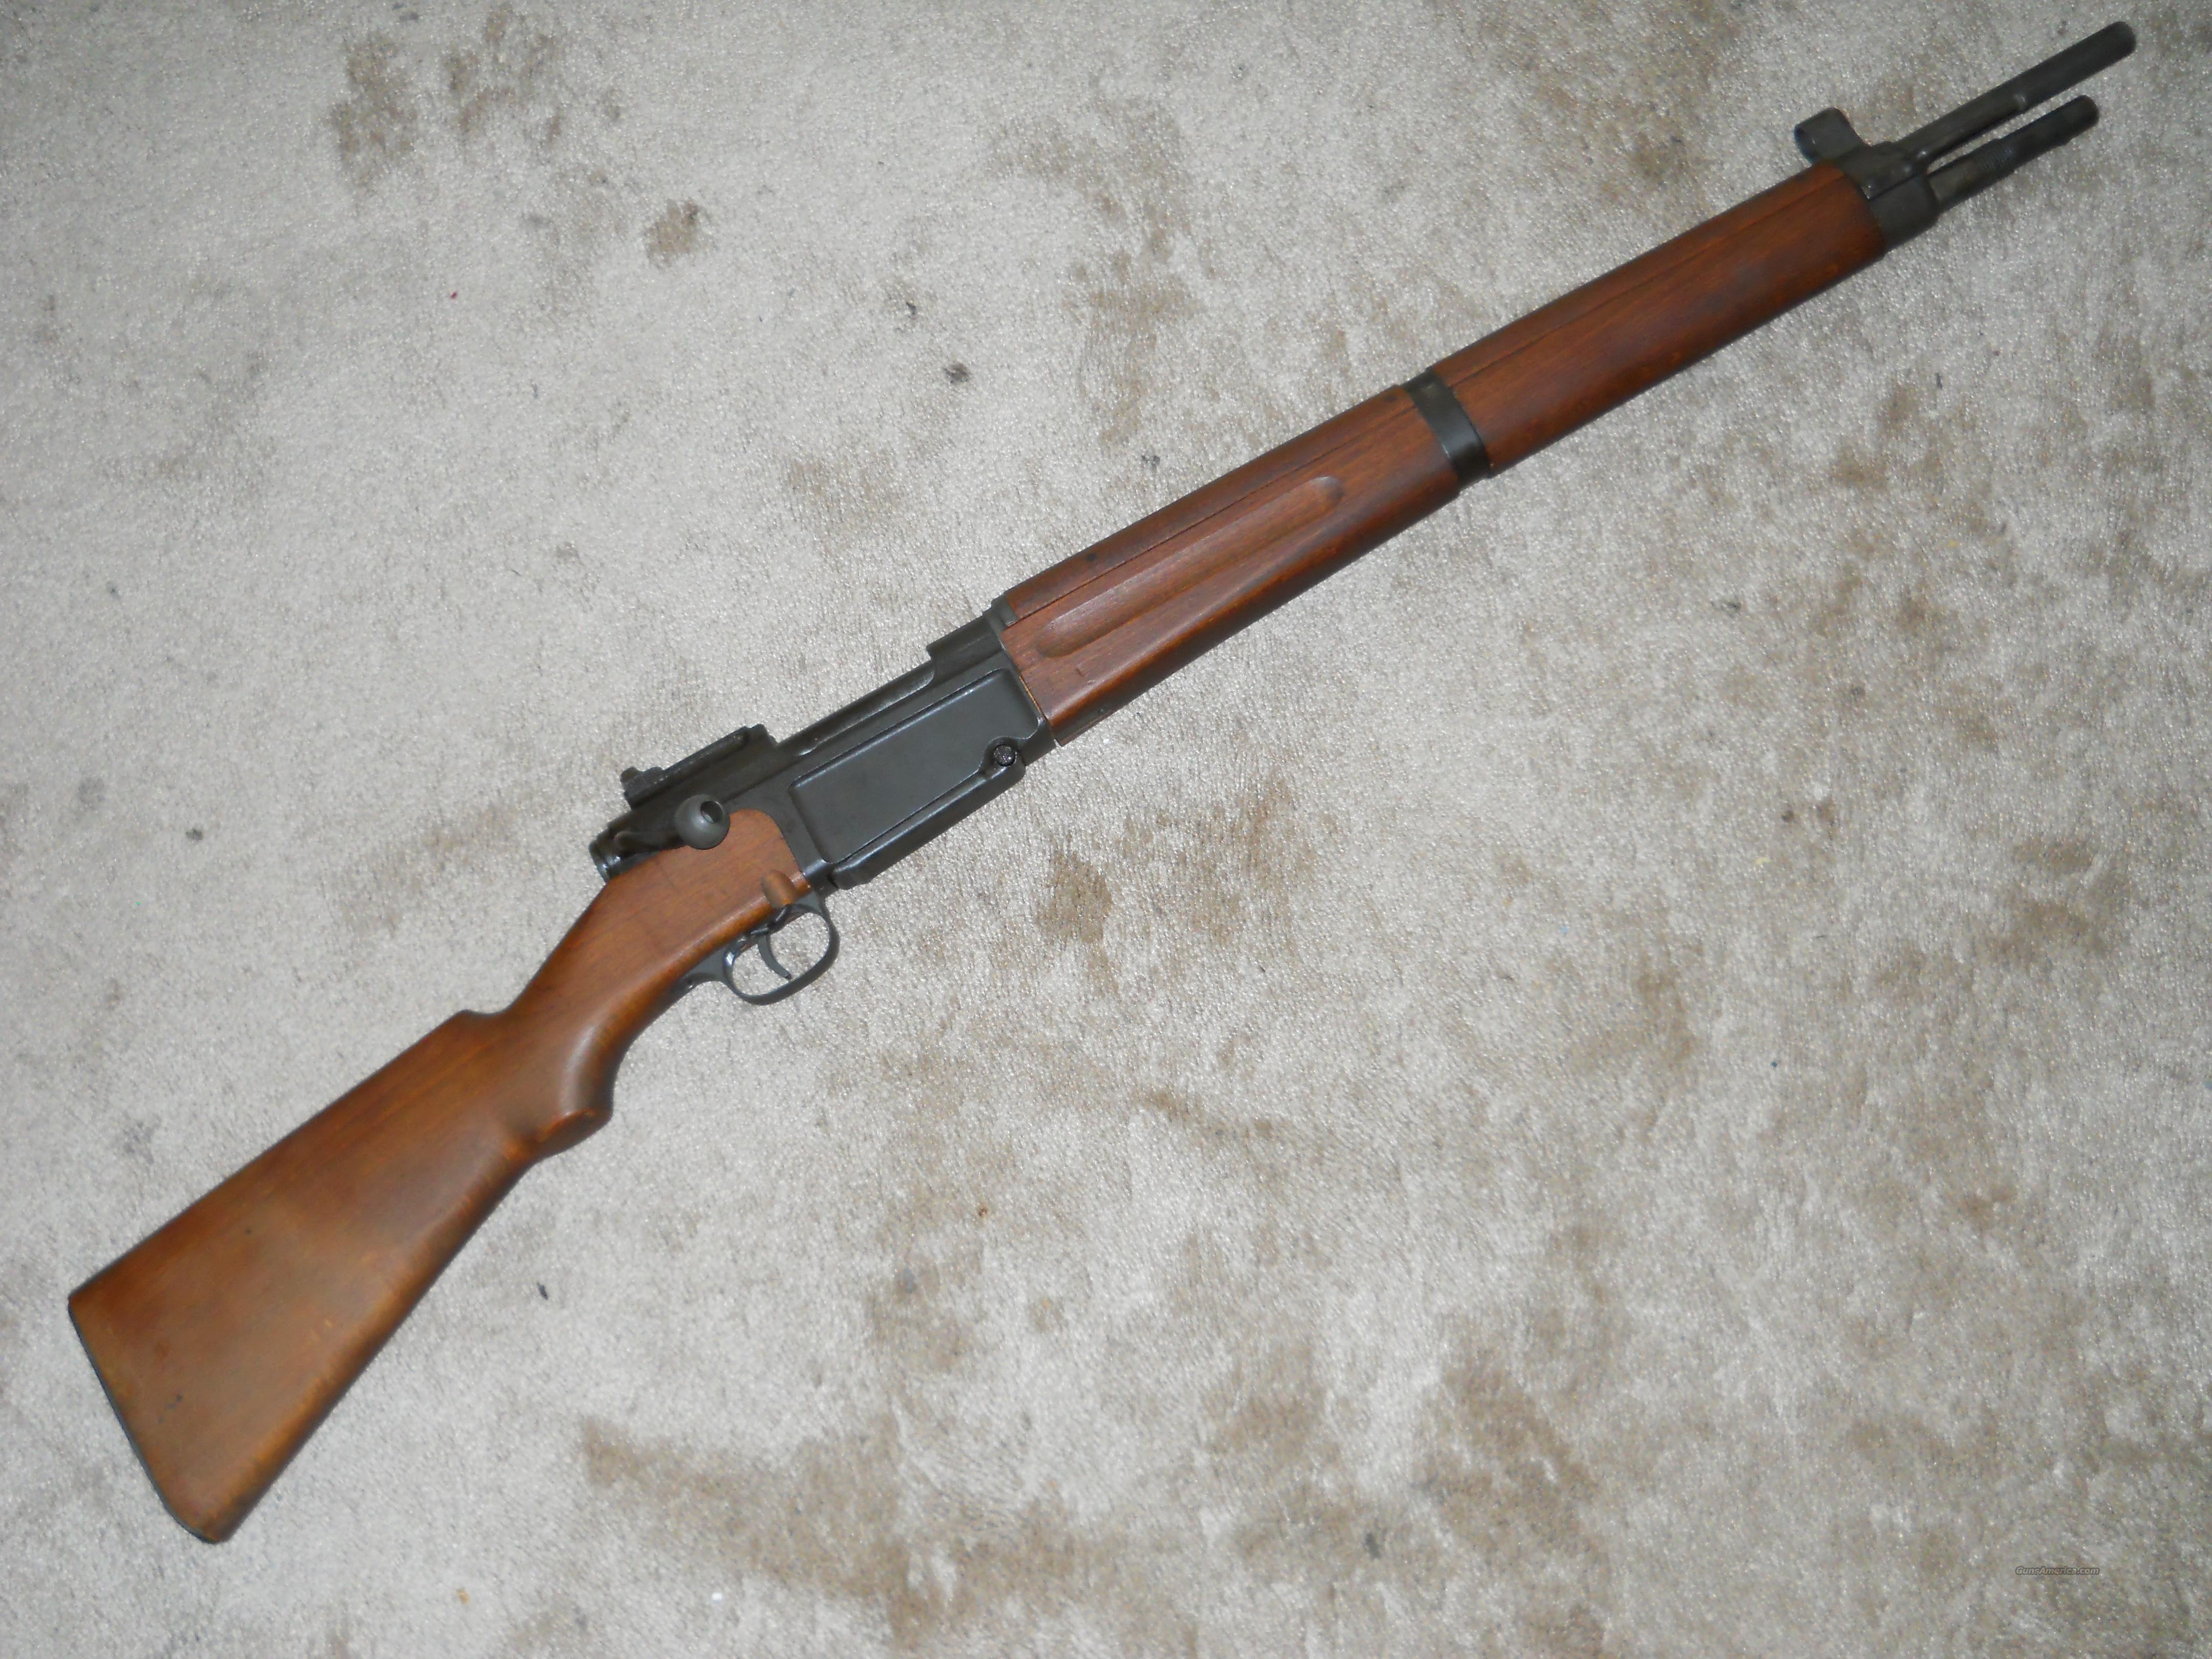 mas 36 rifle Gallery